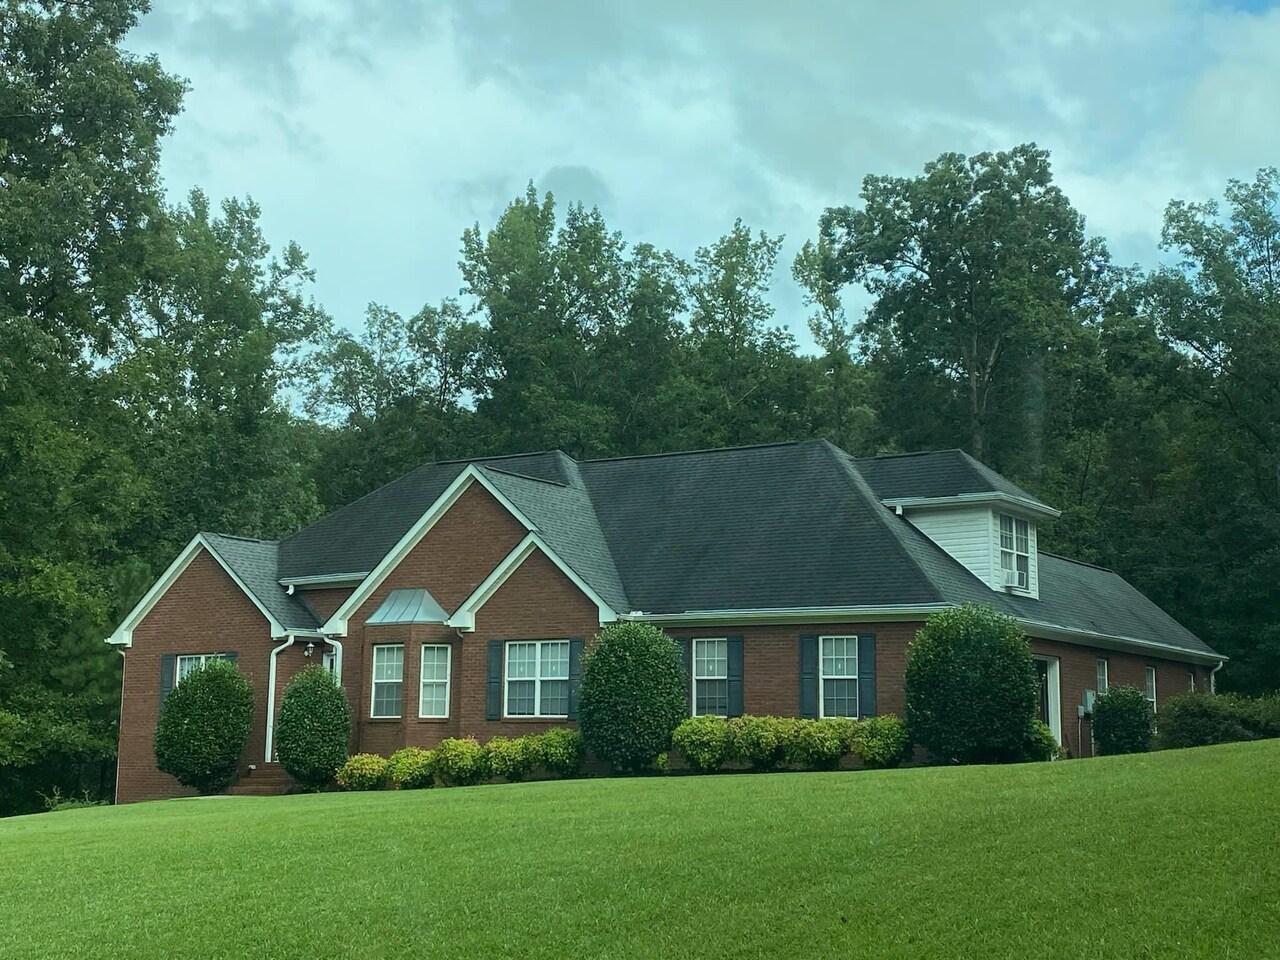 224 Reeves Road, Jackson, GA 30233